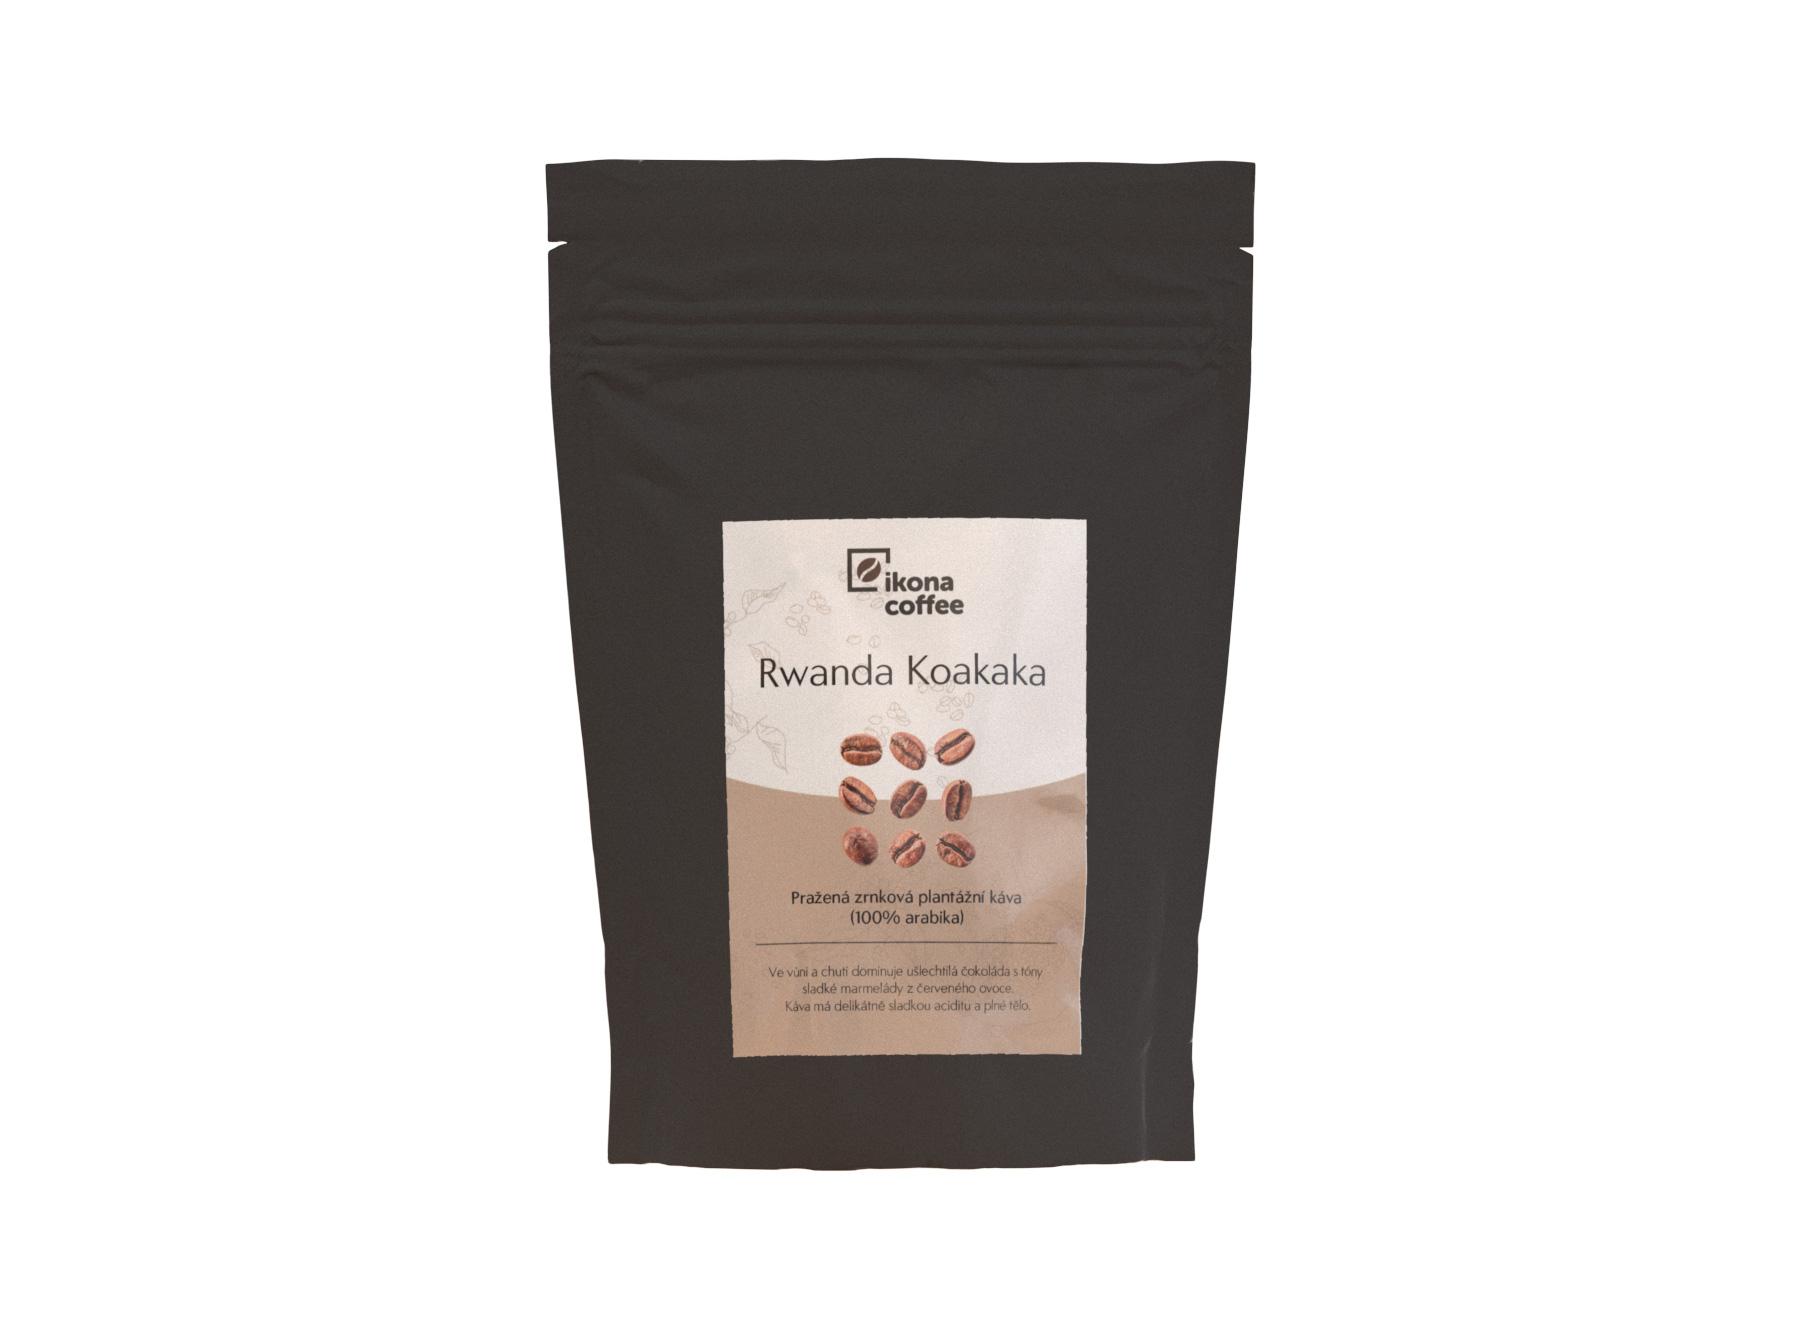 IKONA COFFEE Rwanda Koakaka 150 g